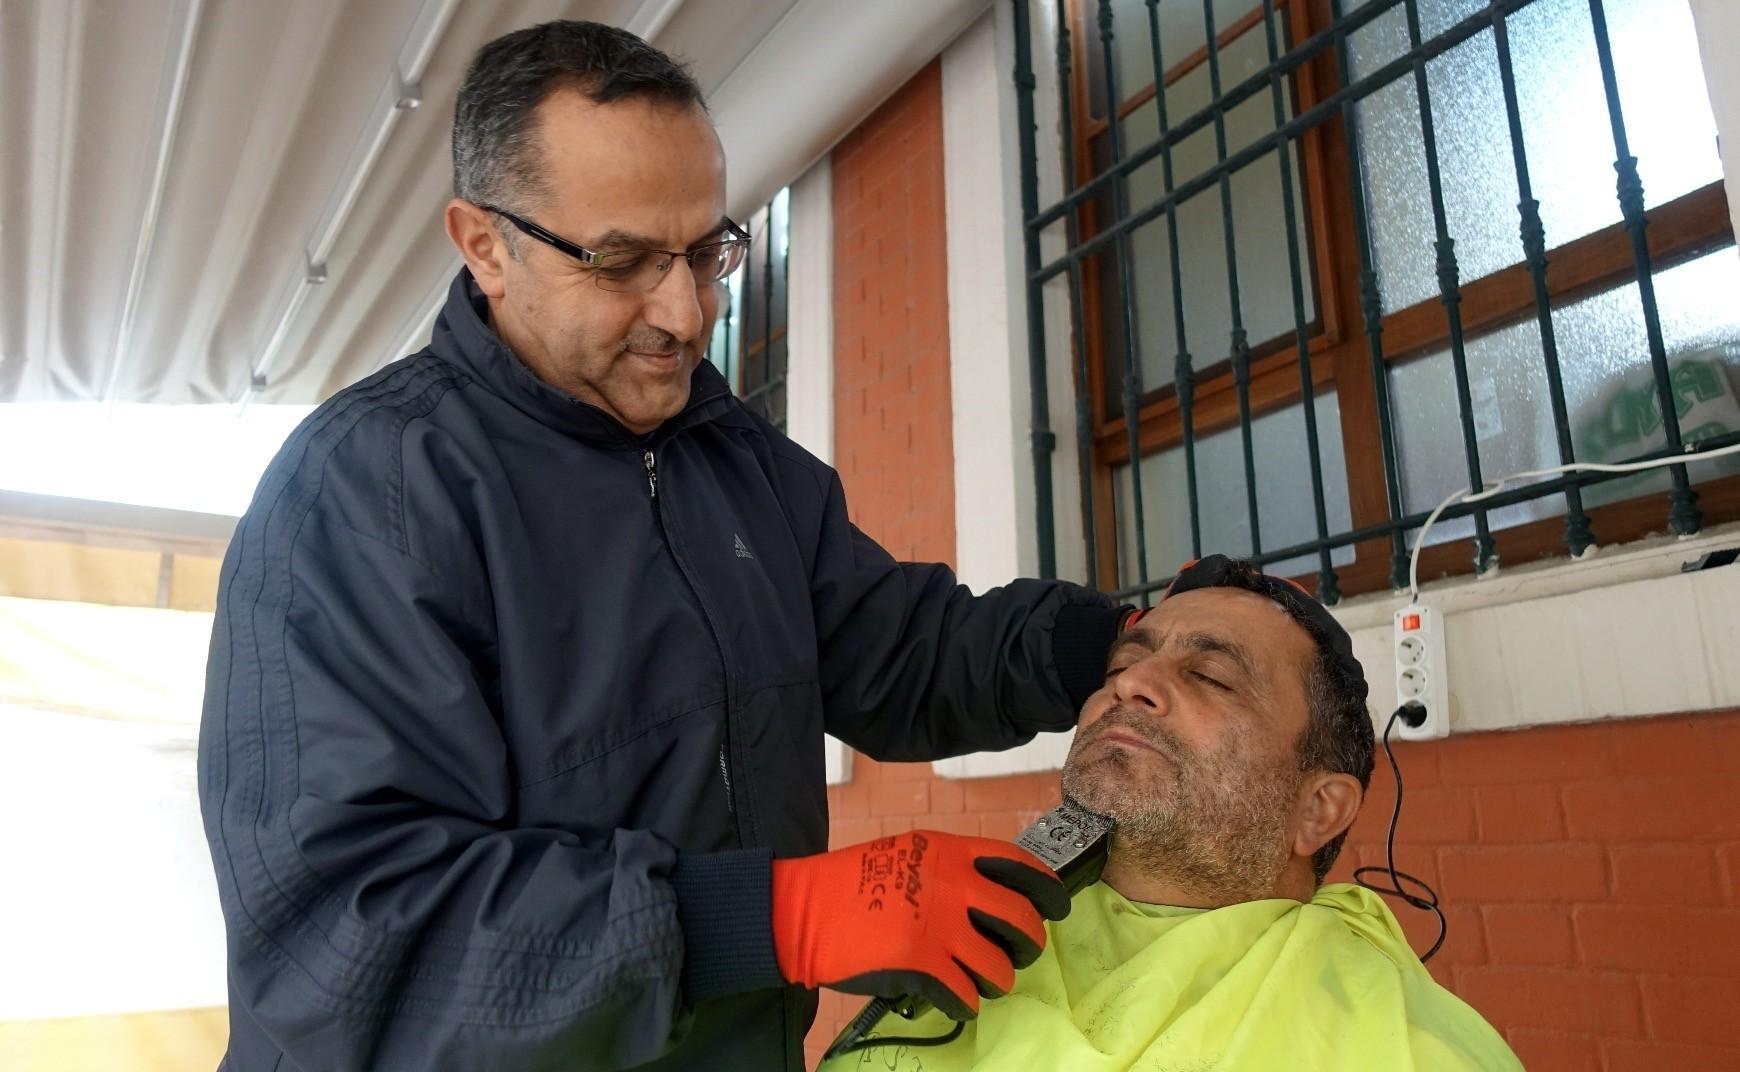 Imam  Osman Gu00f6rkem shaves the beard of a homeless man in Selimiye Hatun Mosque in Beyou011flu, Istanbul.